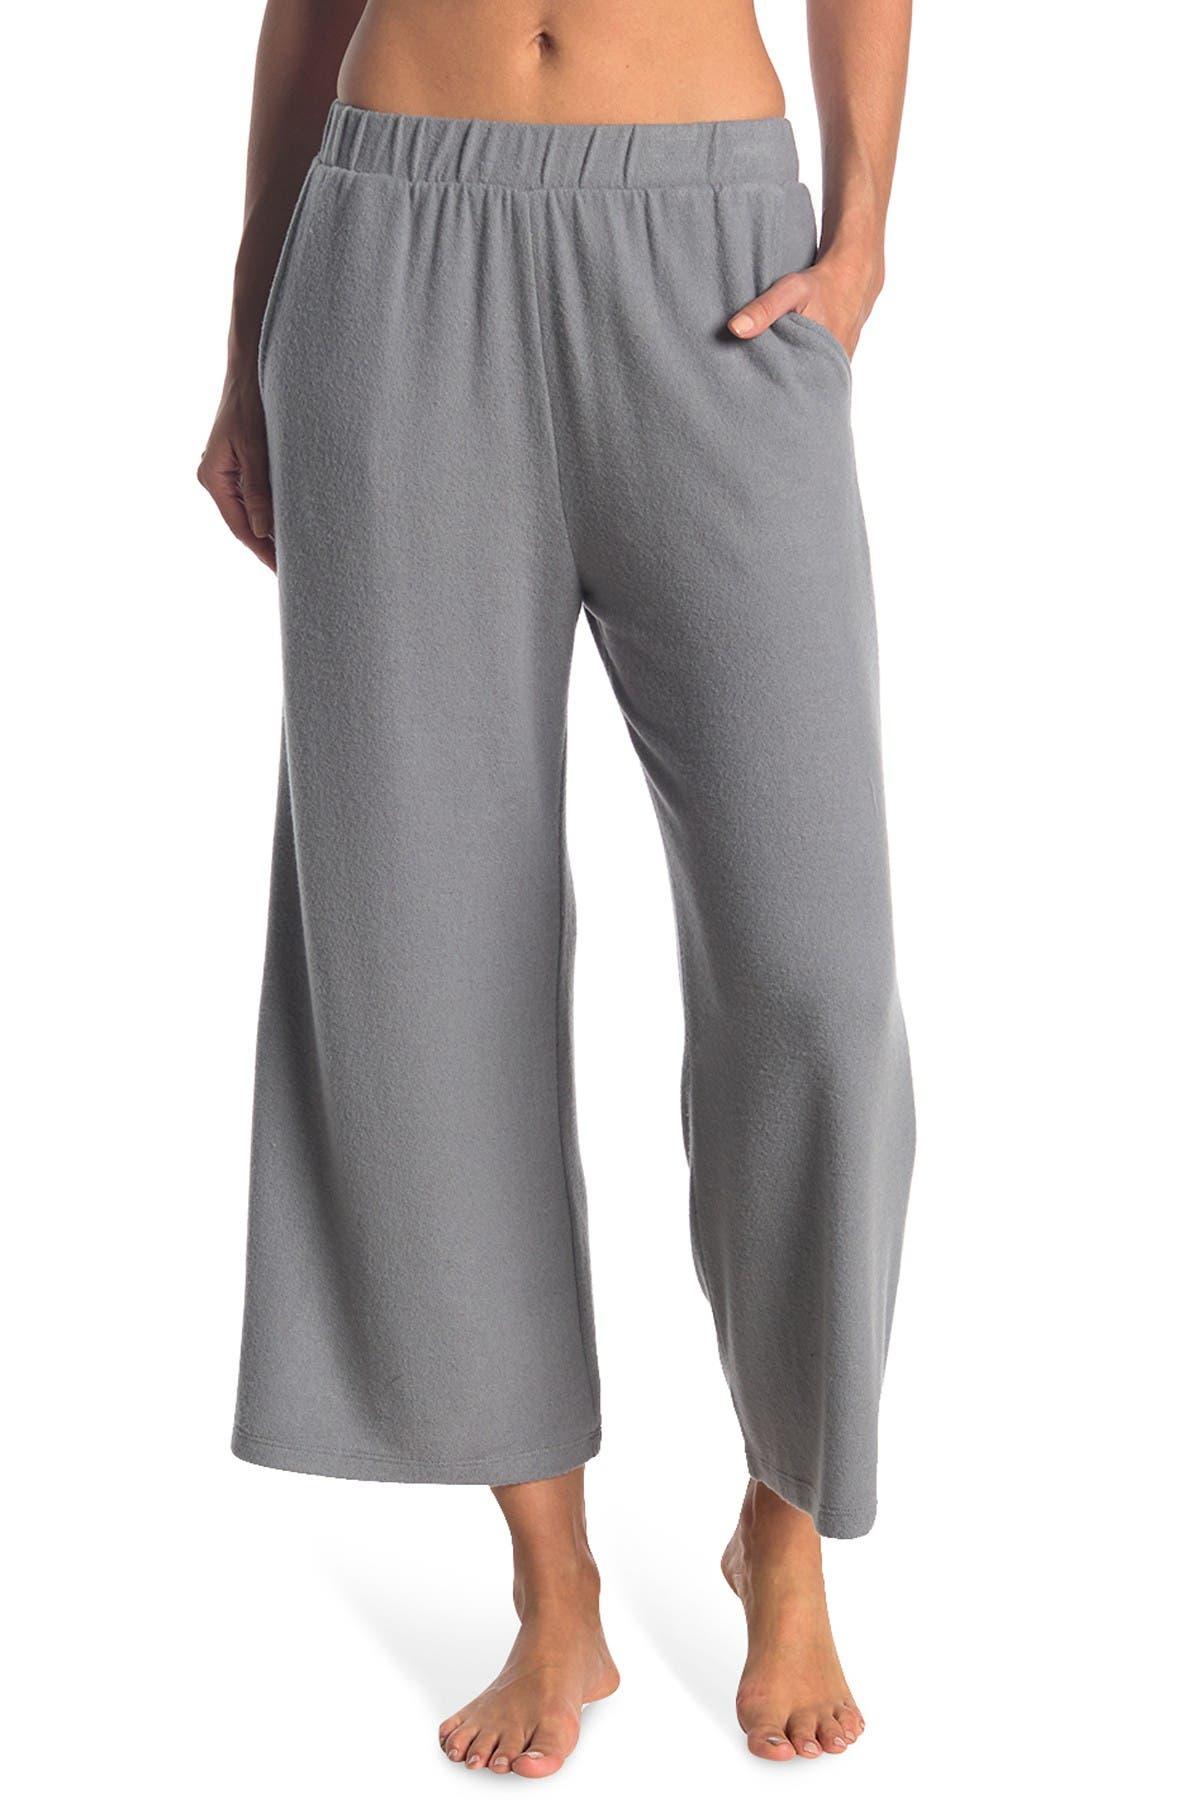 Image of ECLAIR Cozy Wide Leg Pants